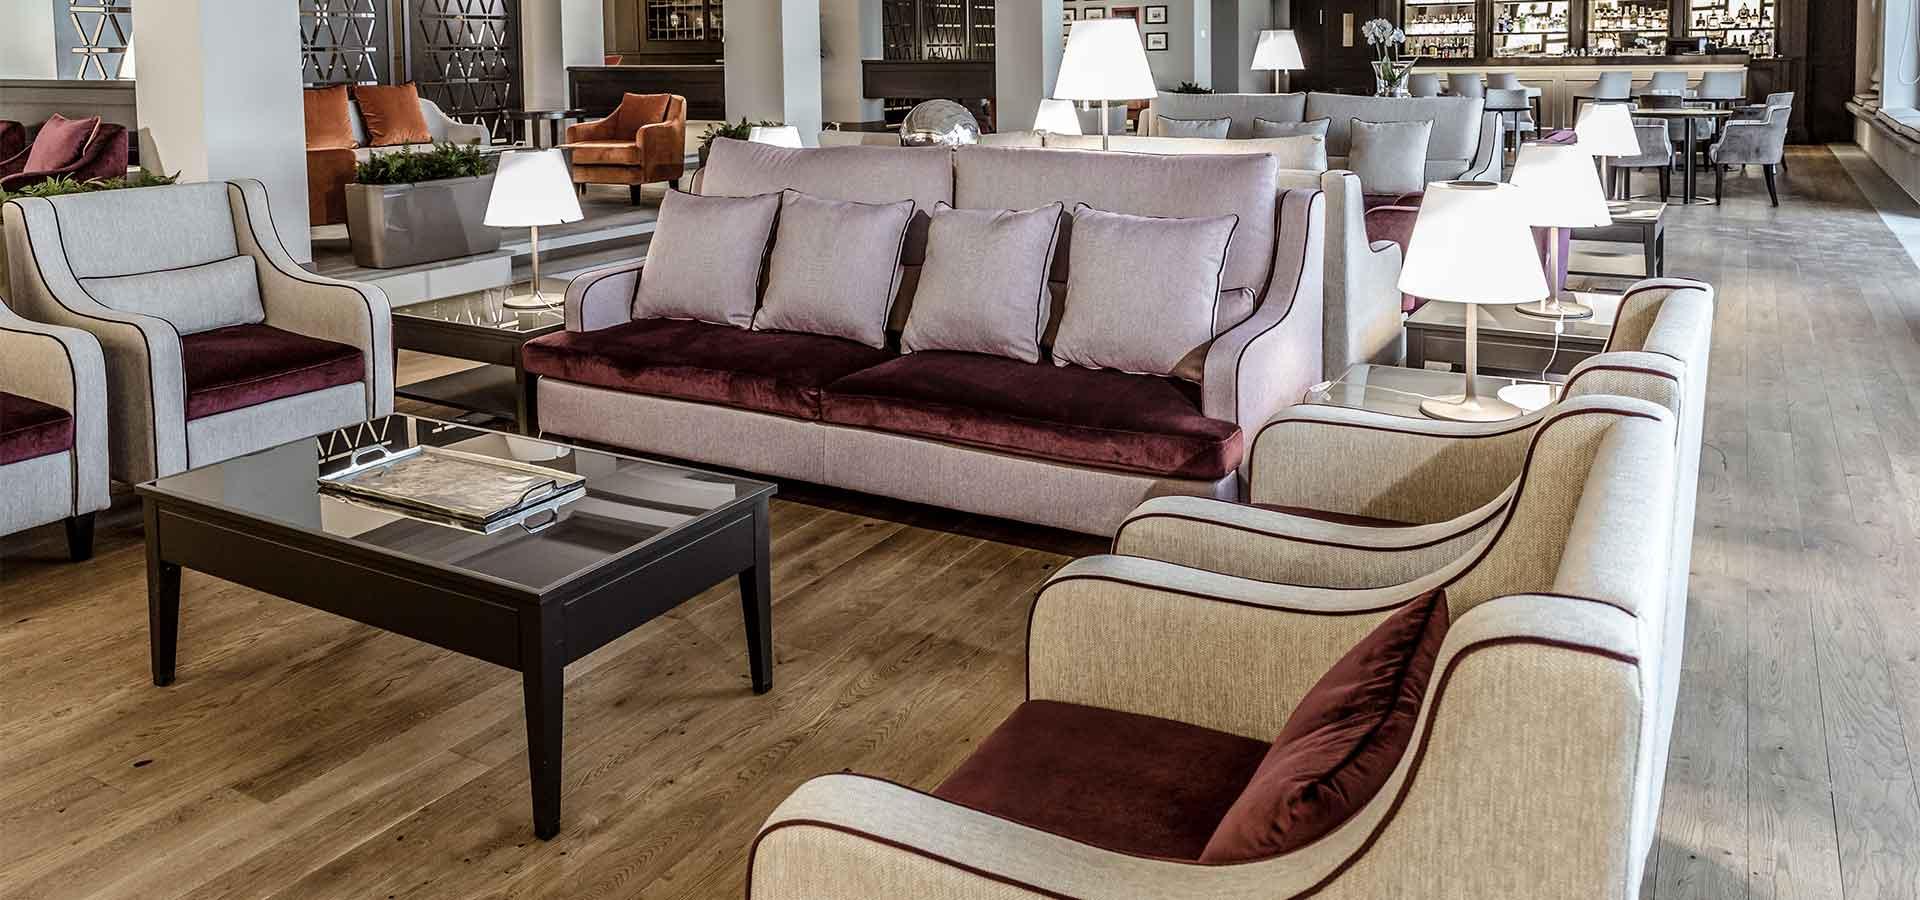 ProgettiReferences_HOTEL-CASTELFALFI_Montaione5